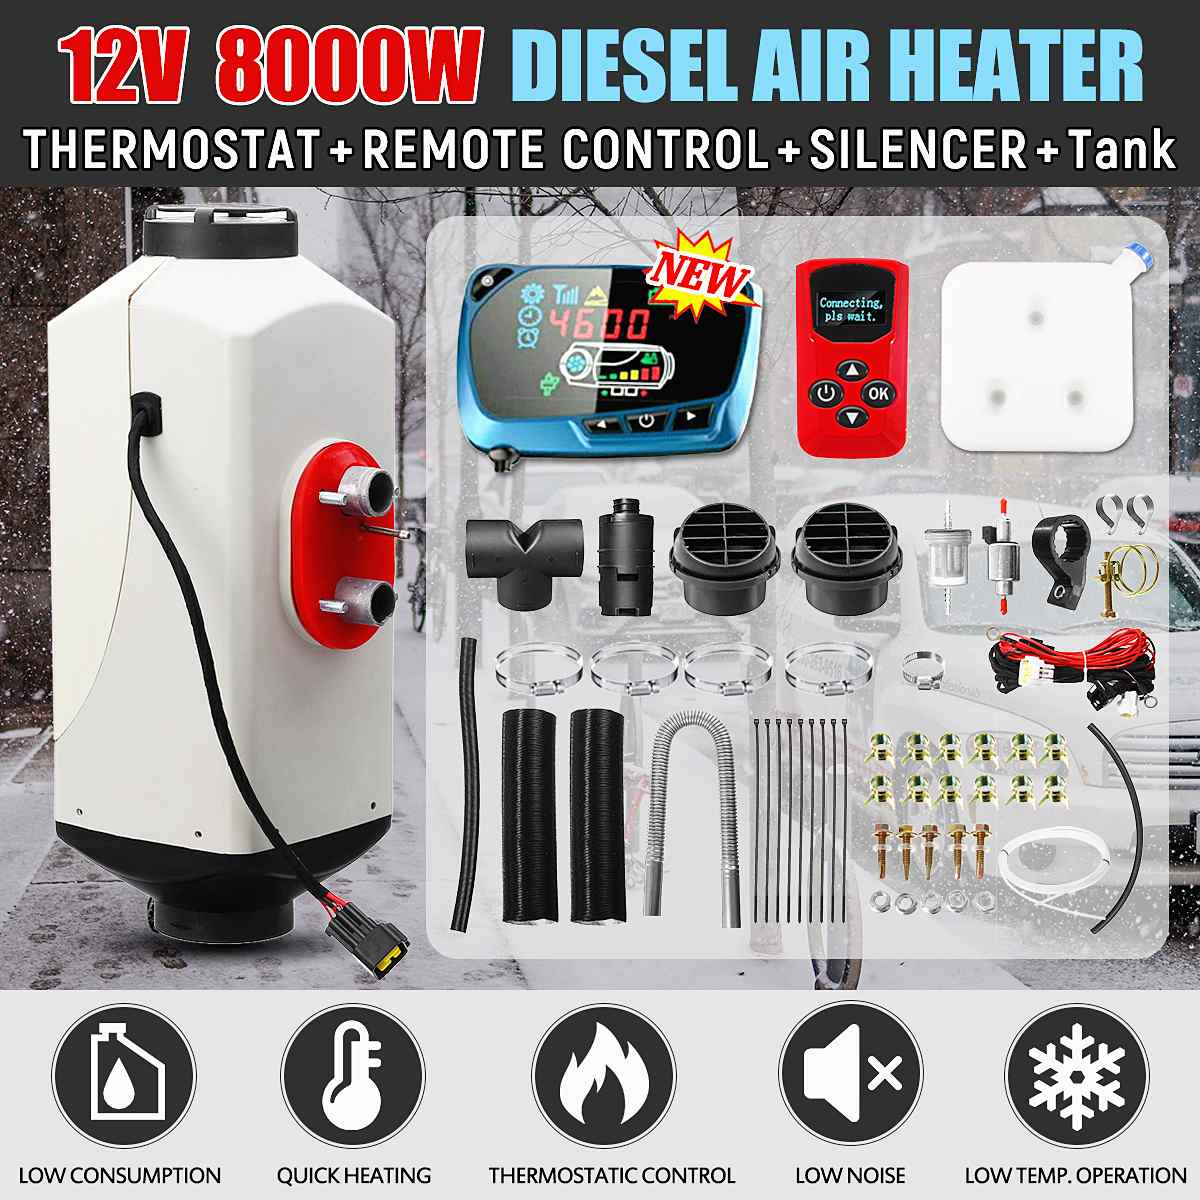 8KW 12V Diesel Air Heater LCD Monitor Remote Control Silencer Metal Shell Air Parking Heater For RV Caravan Trailer Car Boats